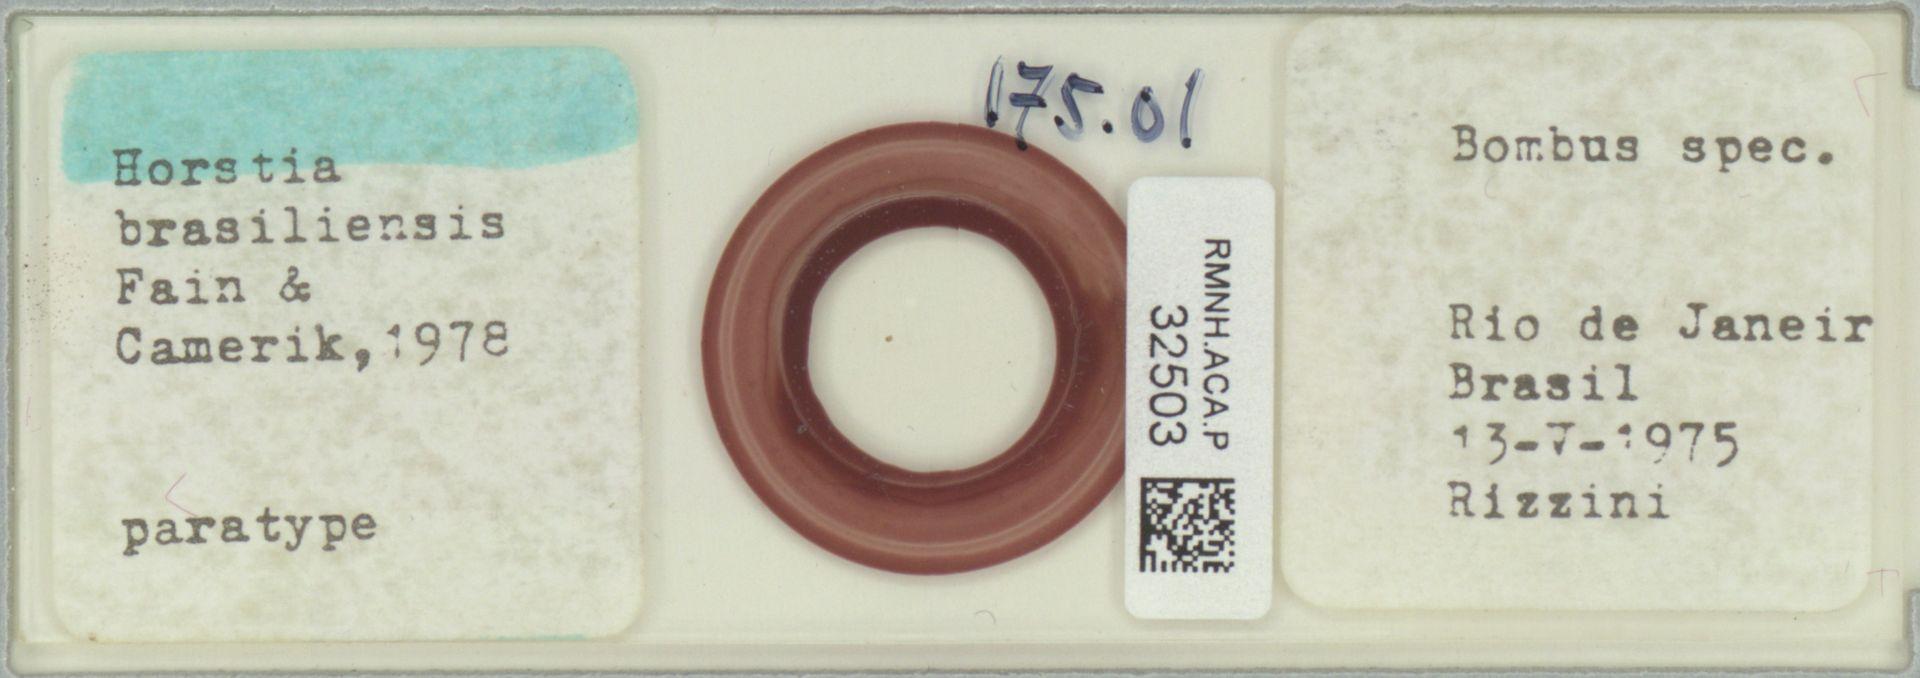 RMNH.ACA.P.32503 | Horstia brasiliensis Fain & Camerik, 1978